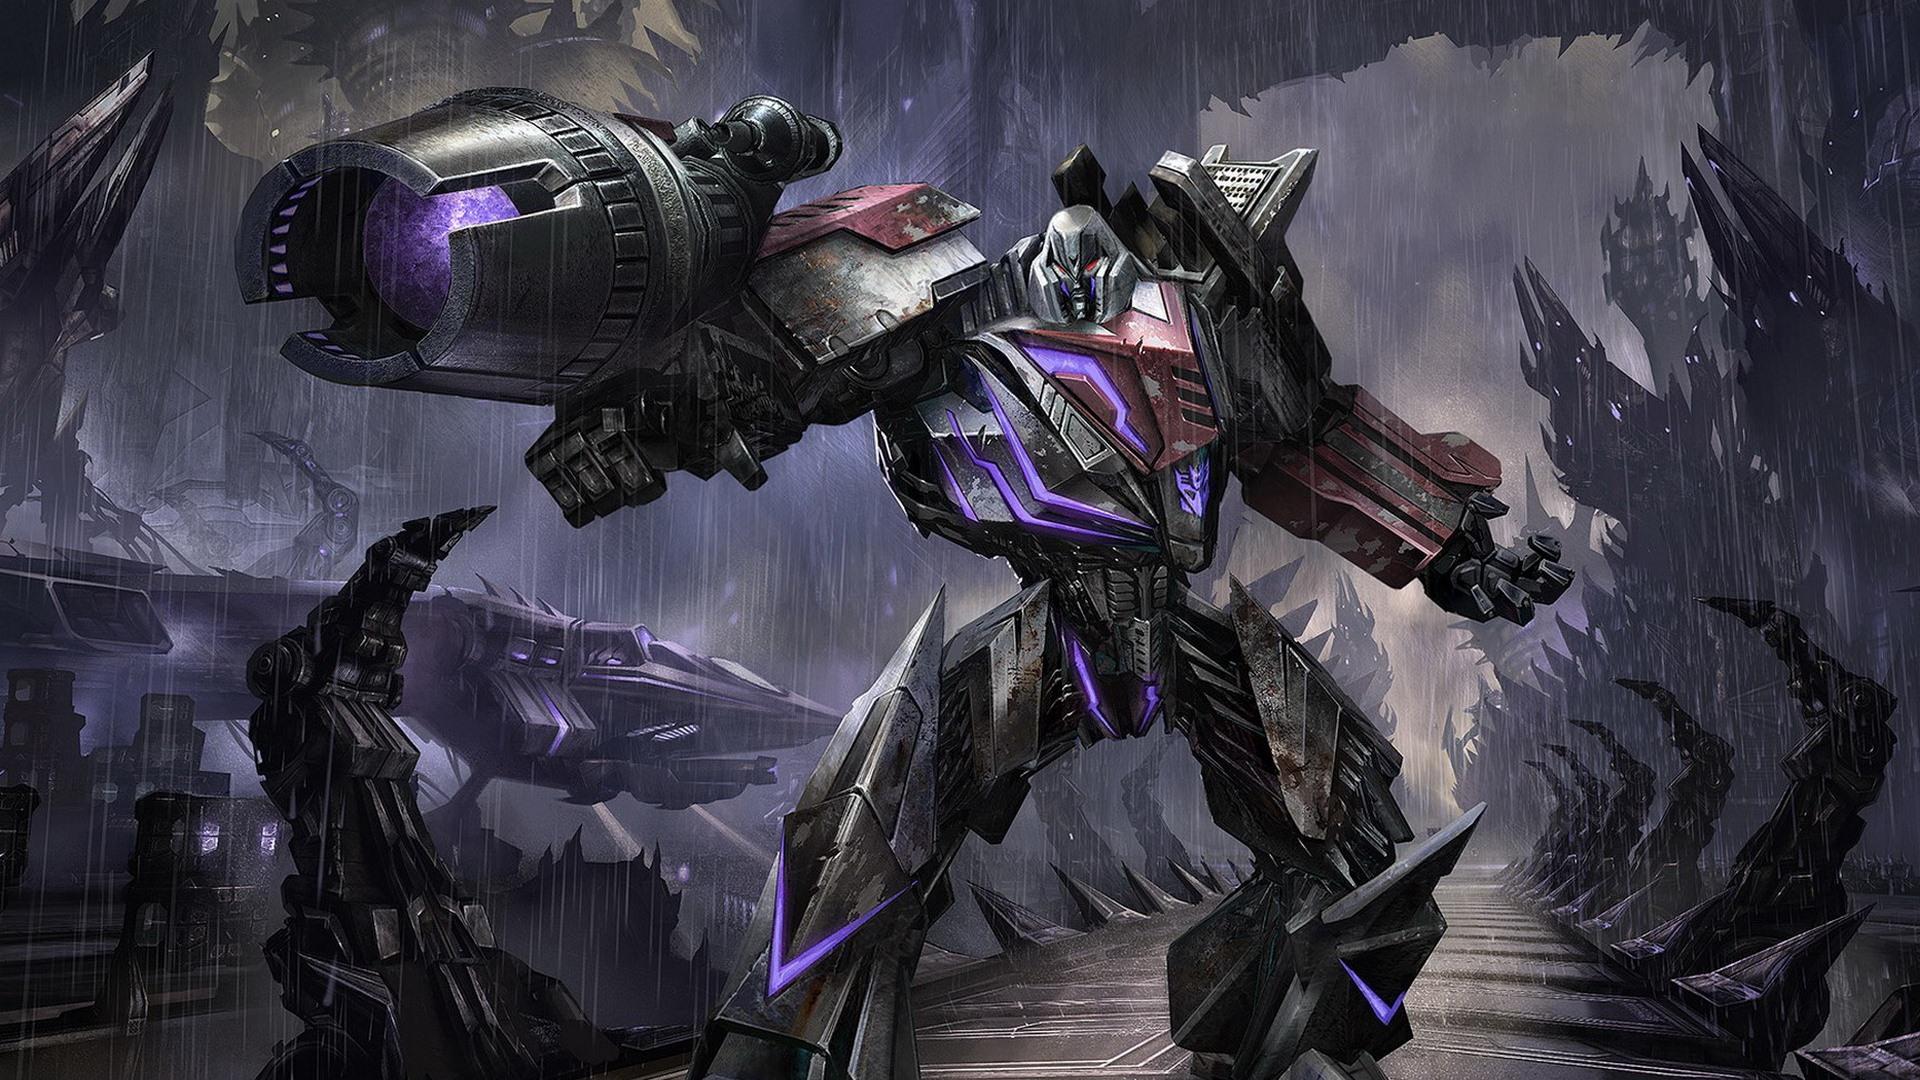 Transformers Fall of Cybertron Megatron Wallpaper 1920x1080